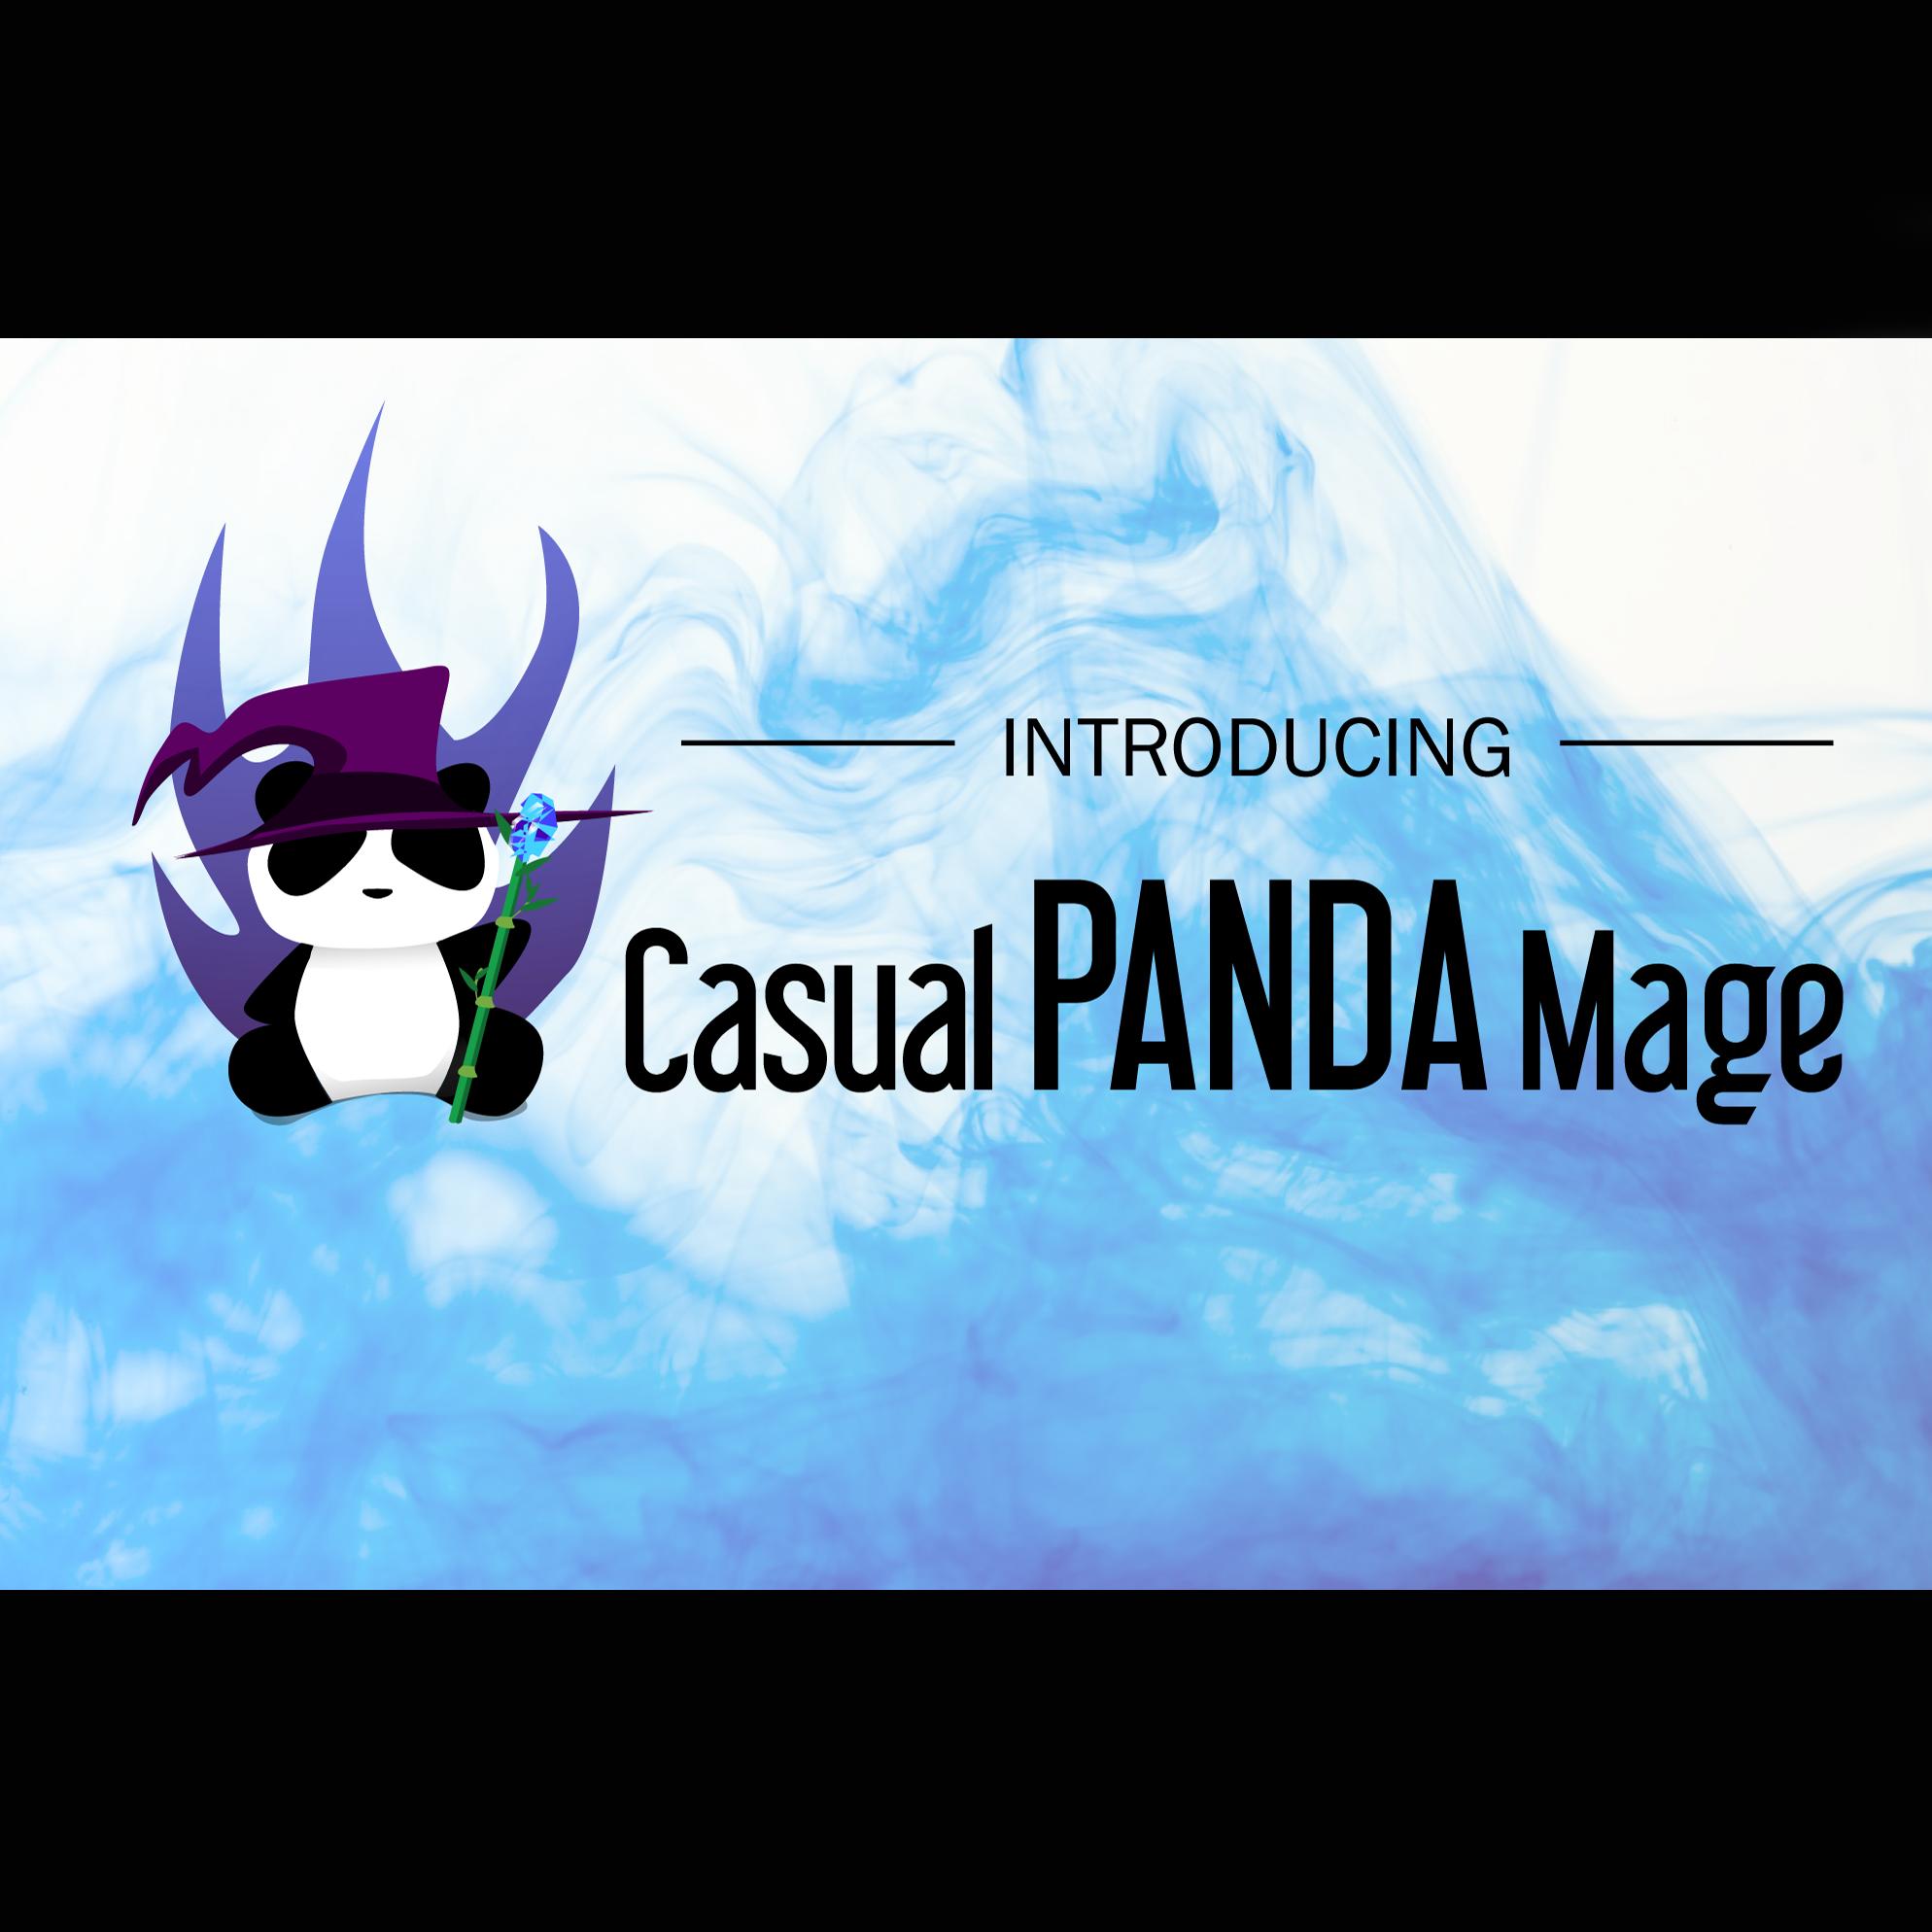 Casual Panda Mage